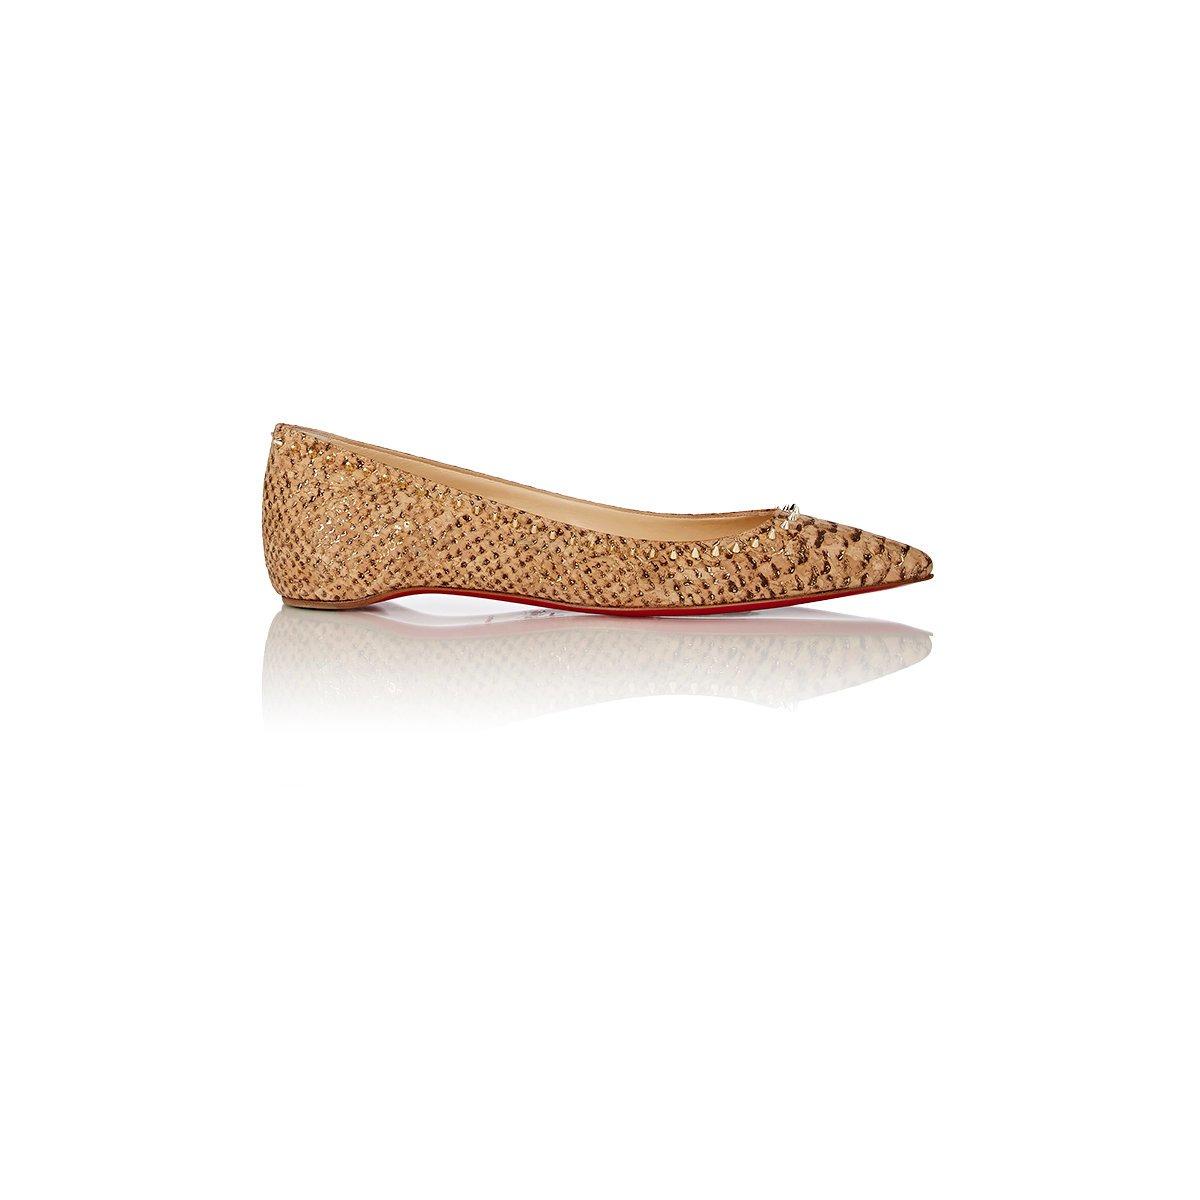 louboutin shoes replica - Christian louboutin Women's Spiked Anjalina Flats in Beige (Nude ...